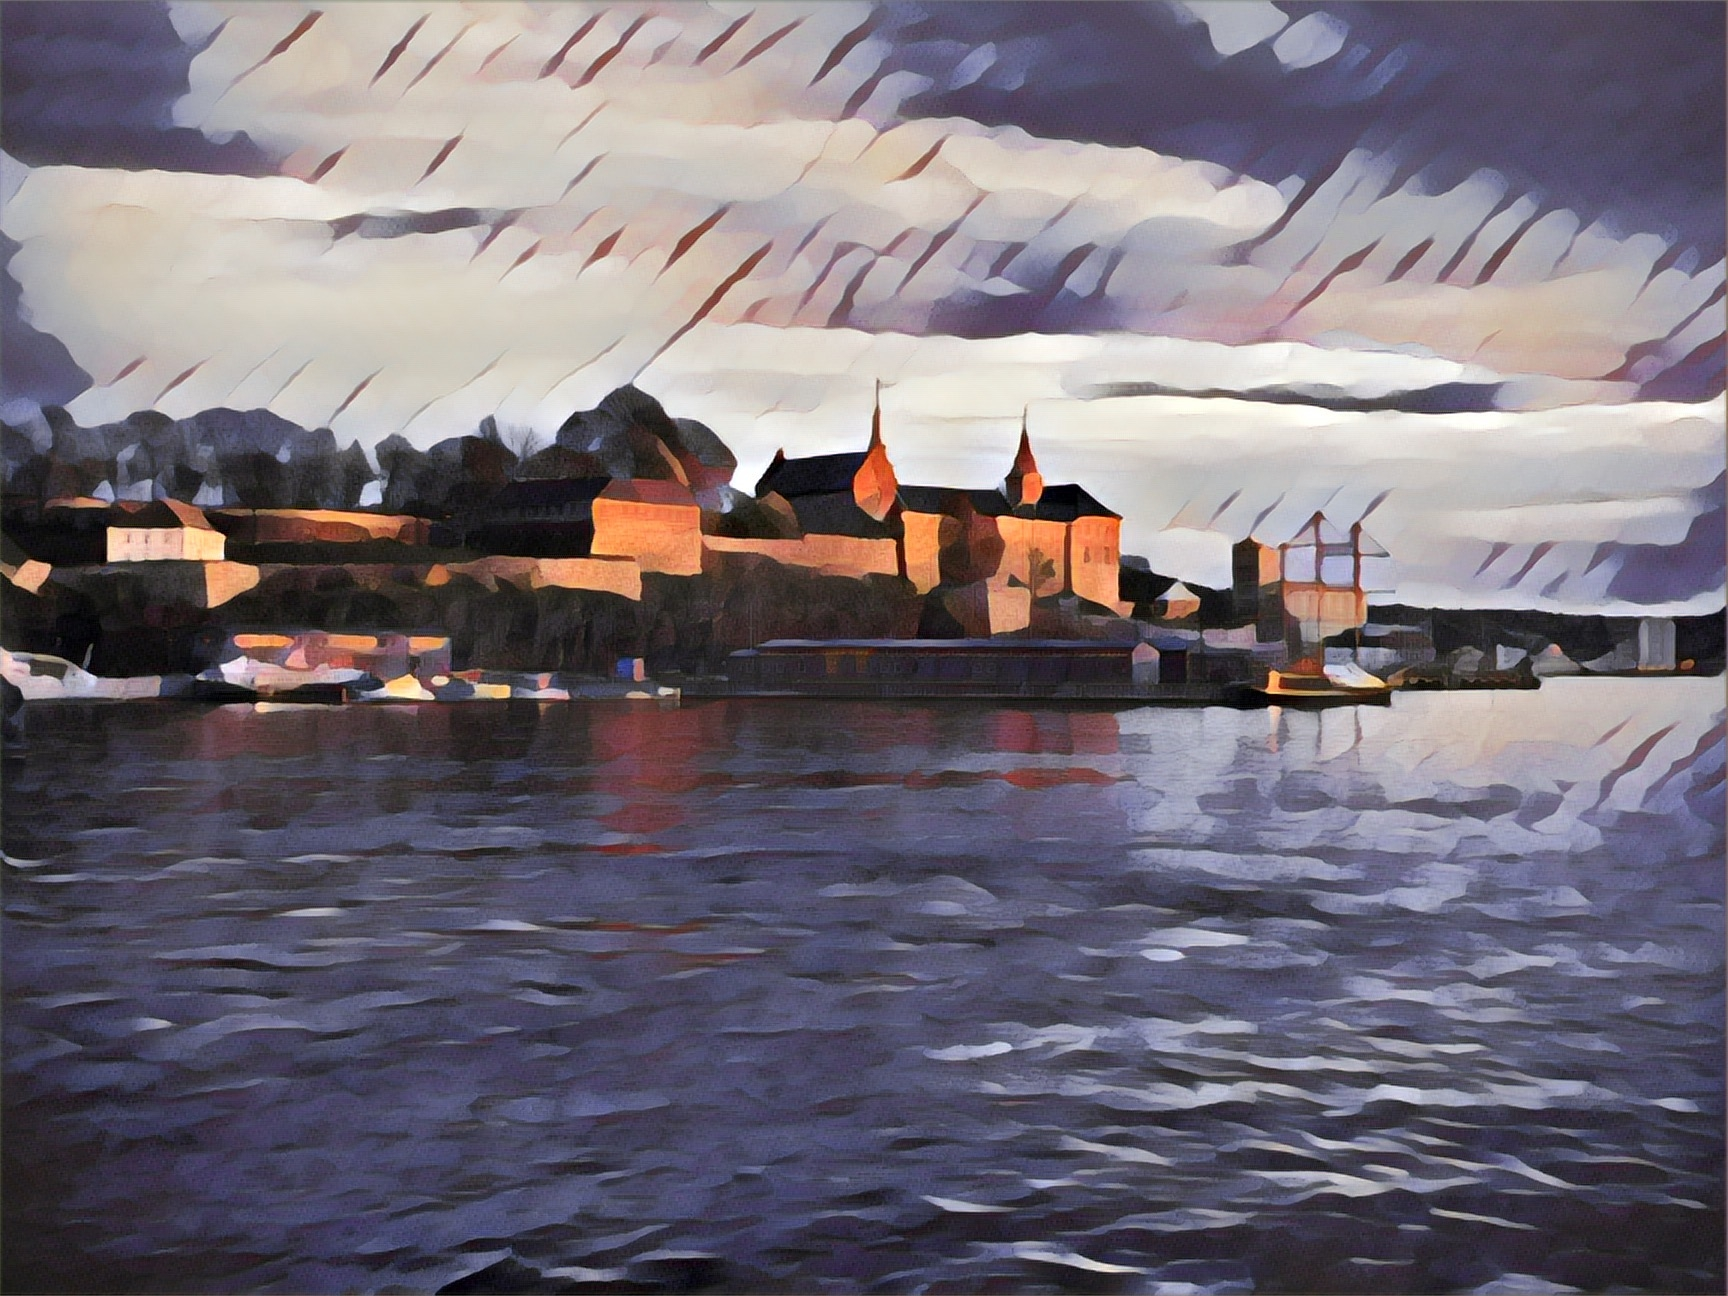 Akershus Festning (Akershus Fortress)